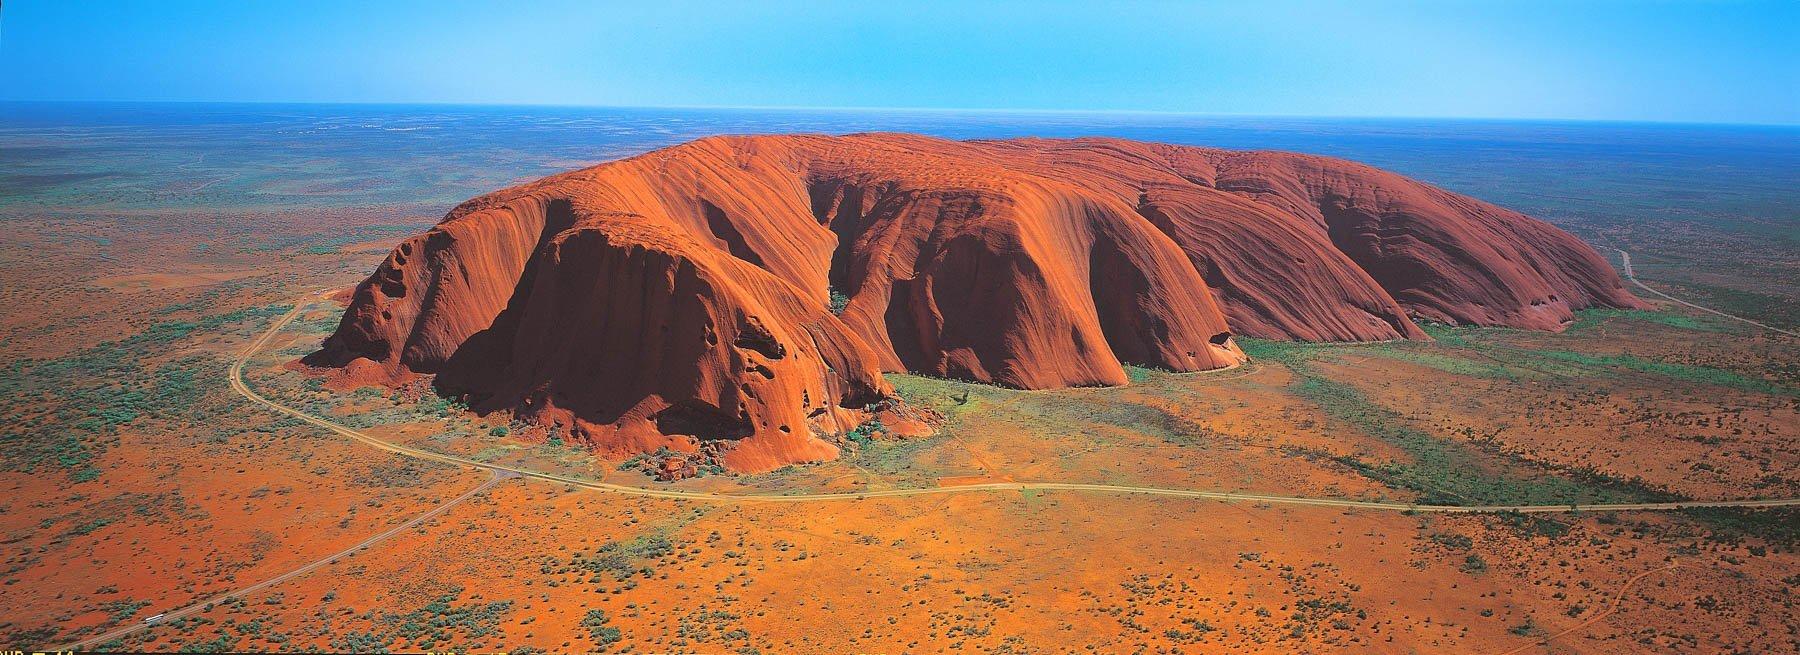 An aerial view of Uluru, NT, Australia.